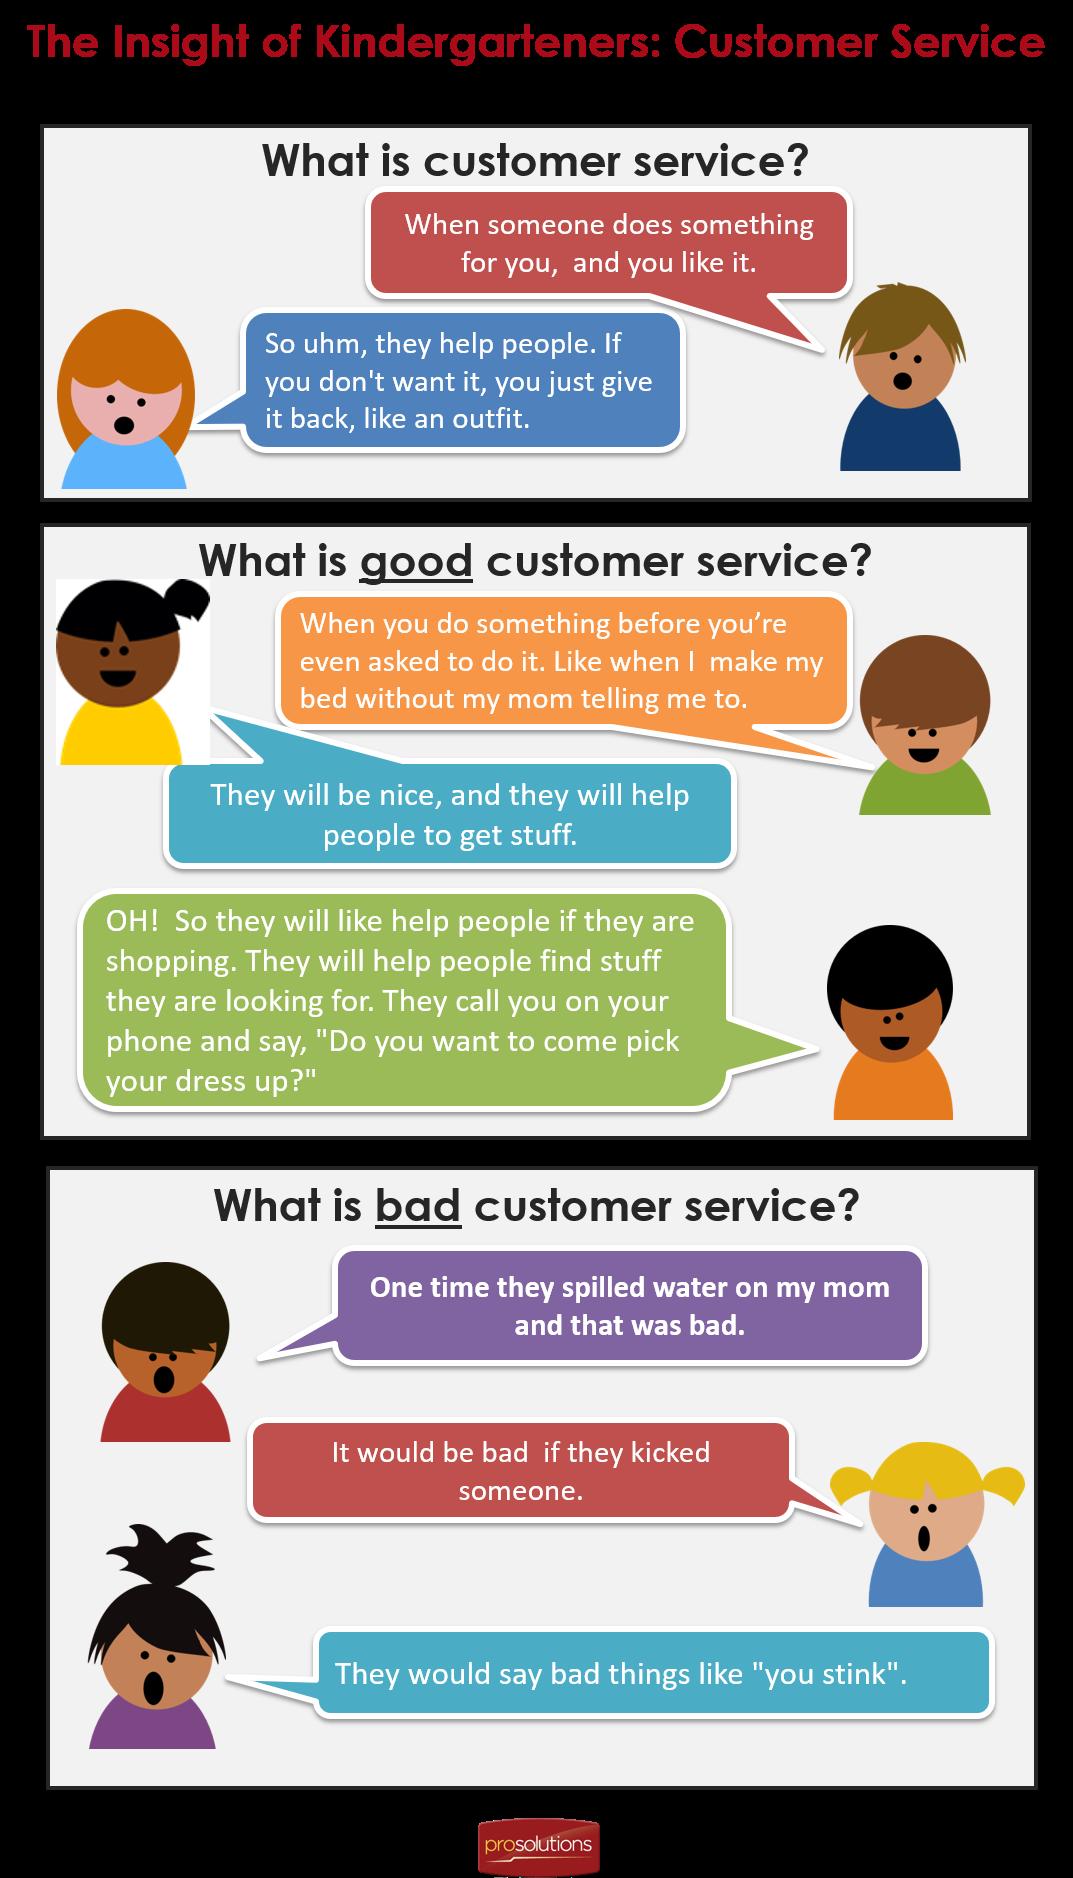 Insights of Kindergarteners 2017 Customer Service.png